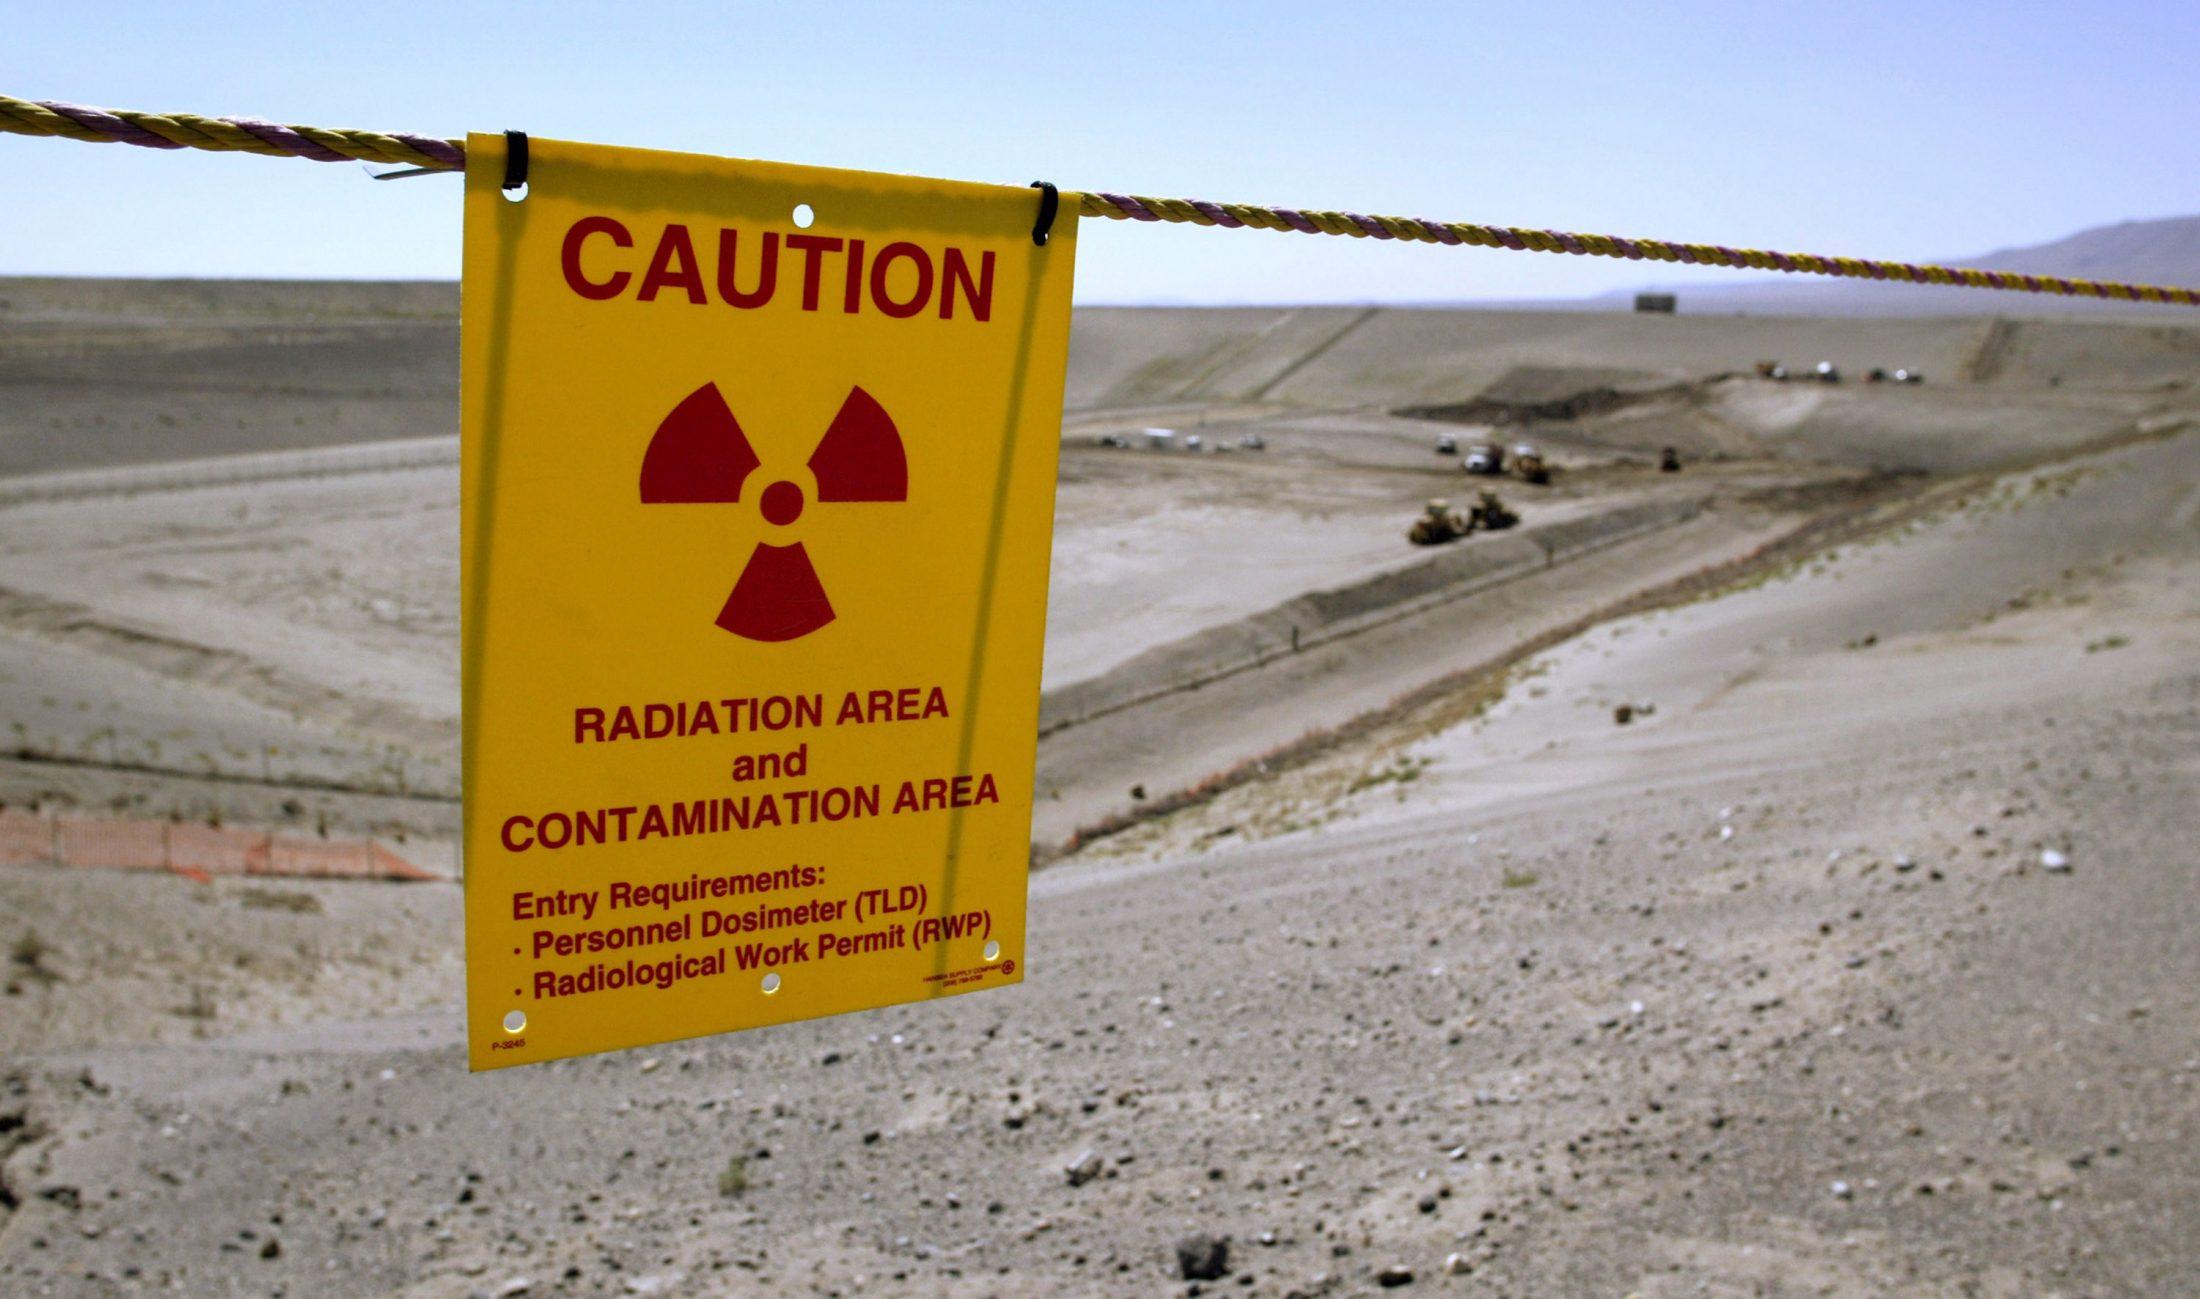 Hanford_radiation_warning_sign.jpg